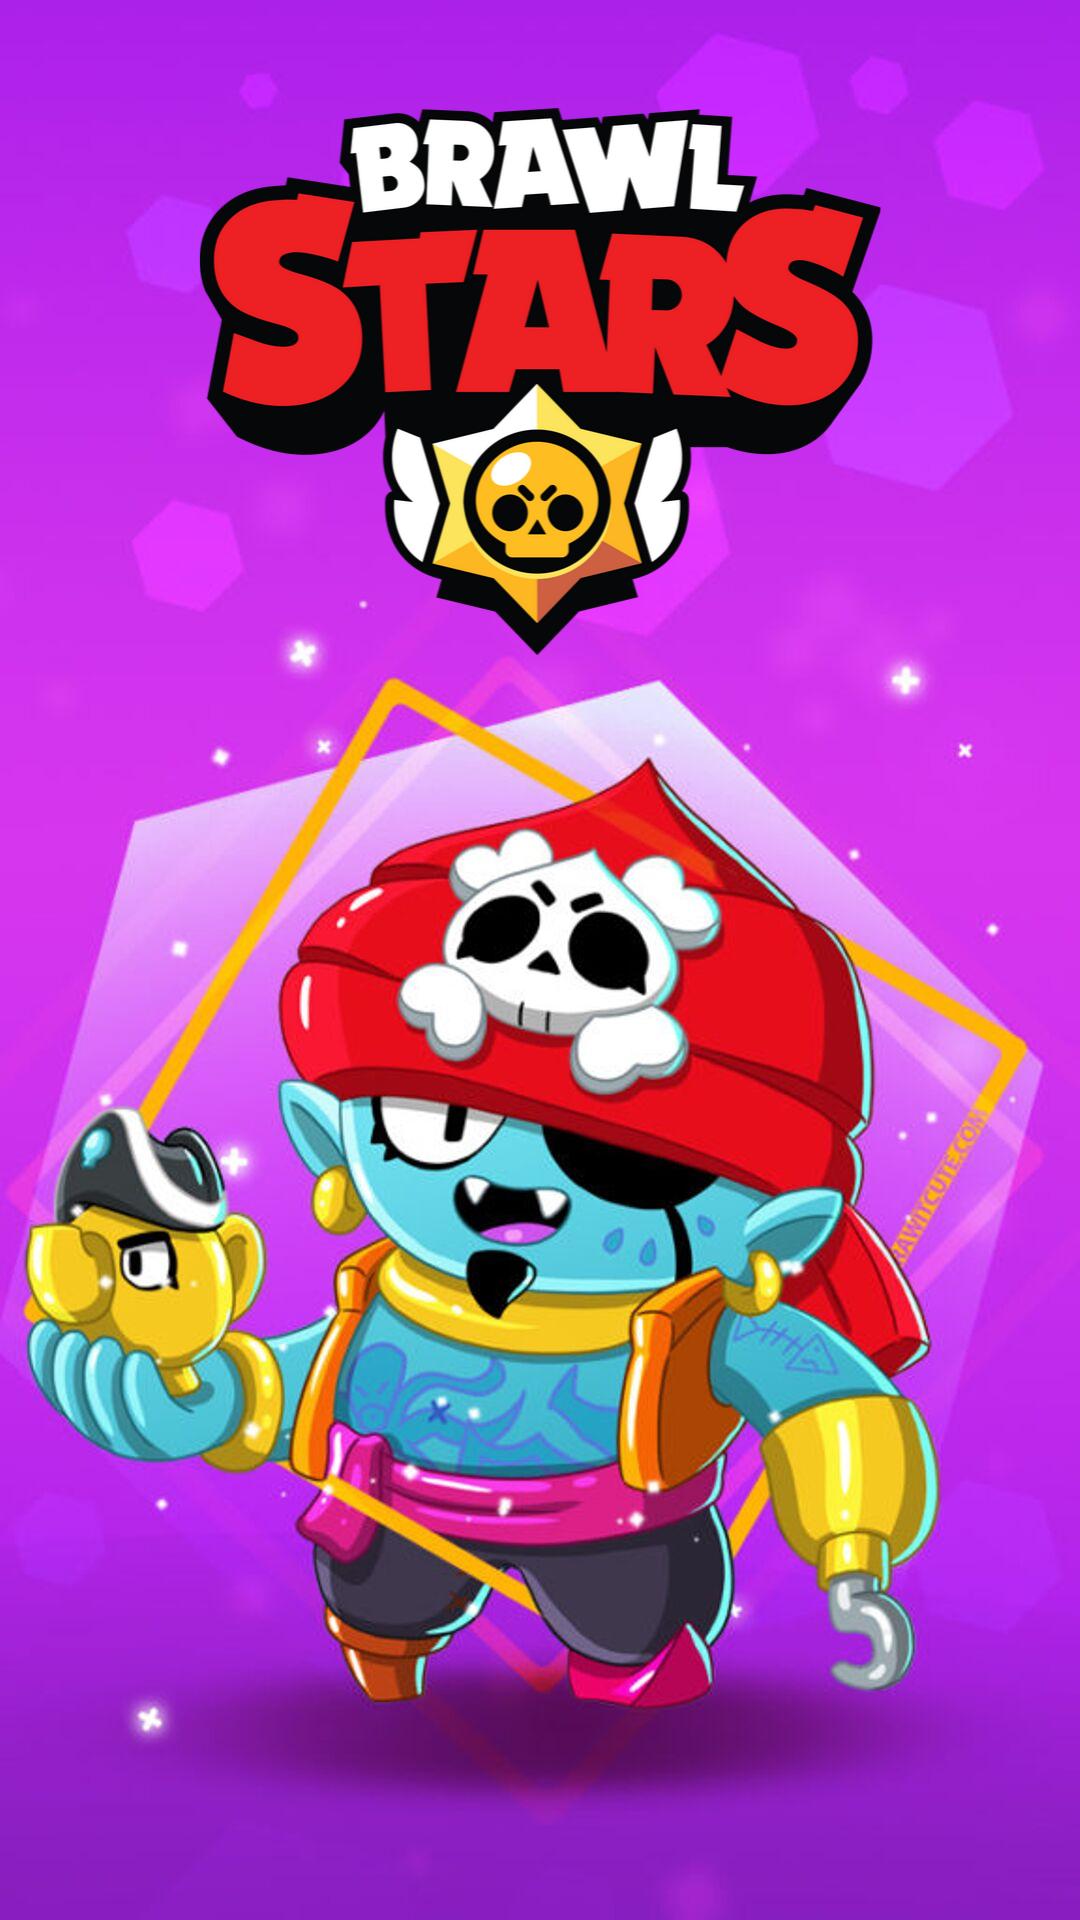 Pirate Gene Brawl Stars New Risunki Pandy Multiplikacionnye Illyutracii Geometricheskij Poster